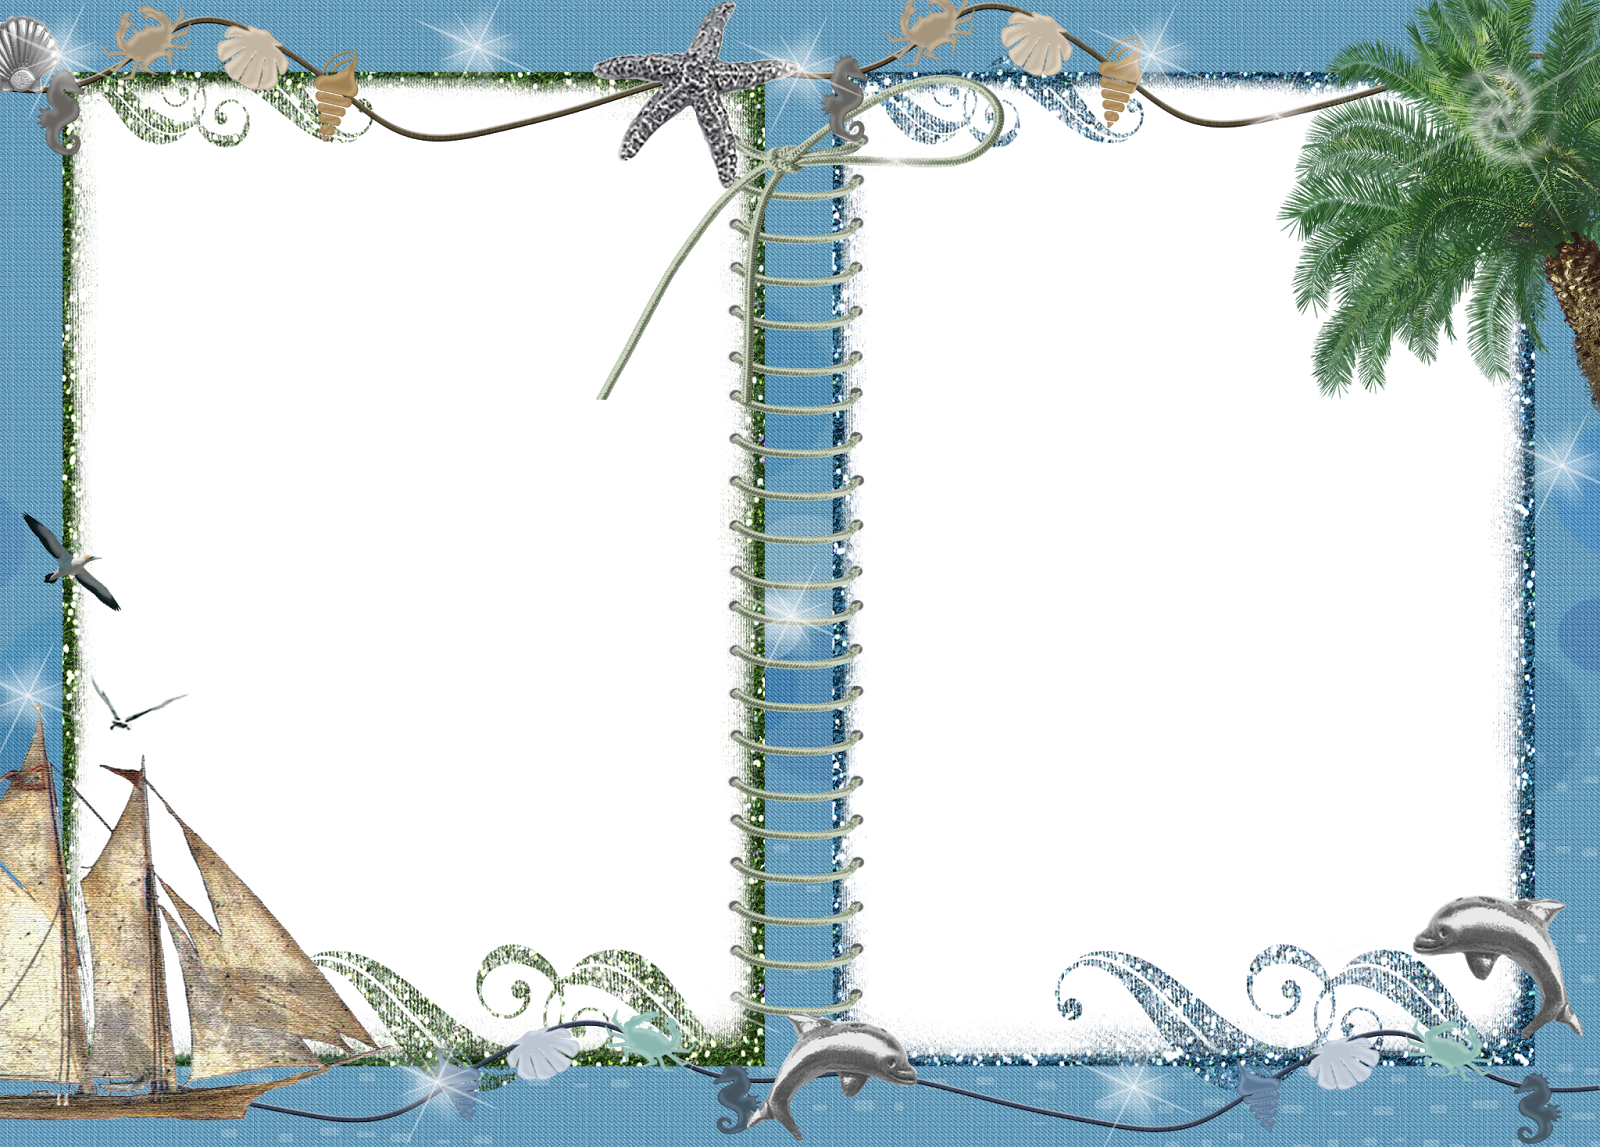 Заставку, шаблон для морской открытки